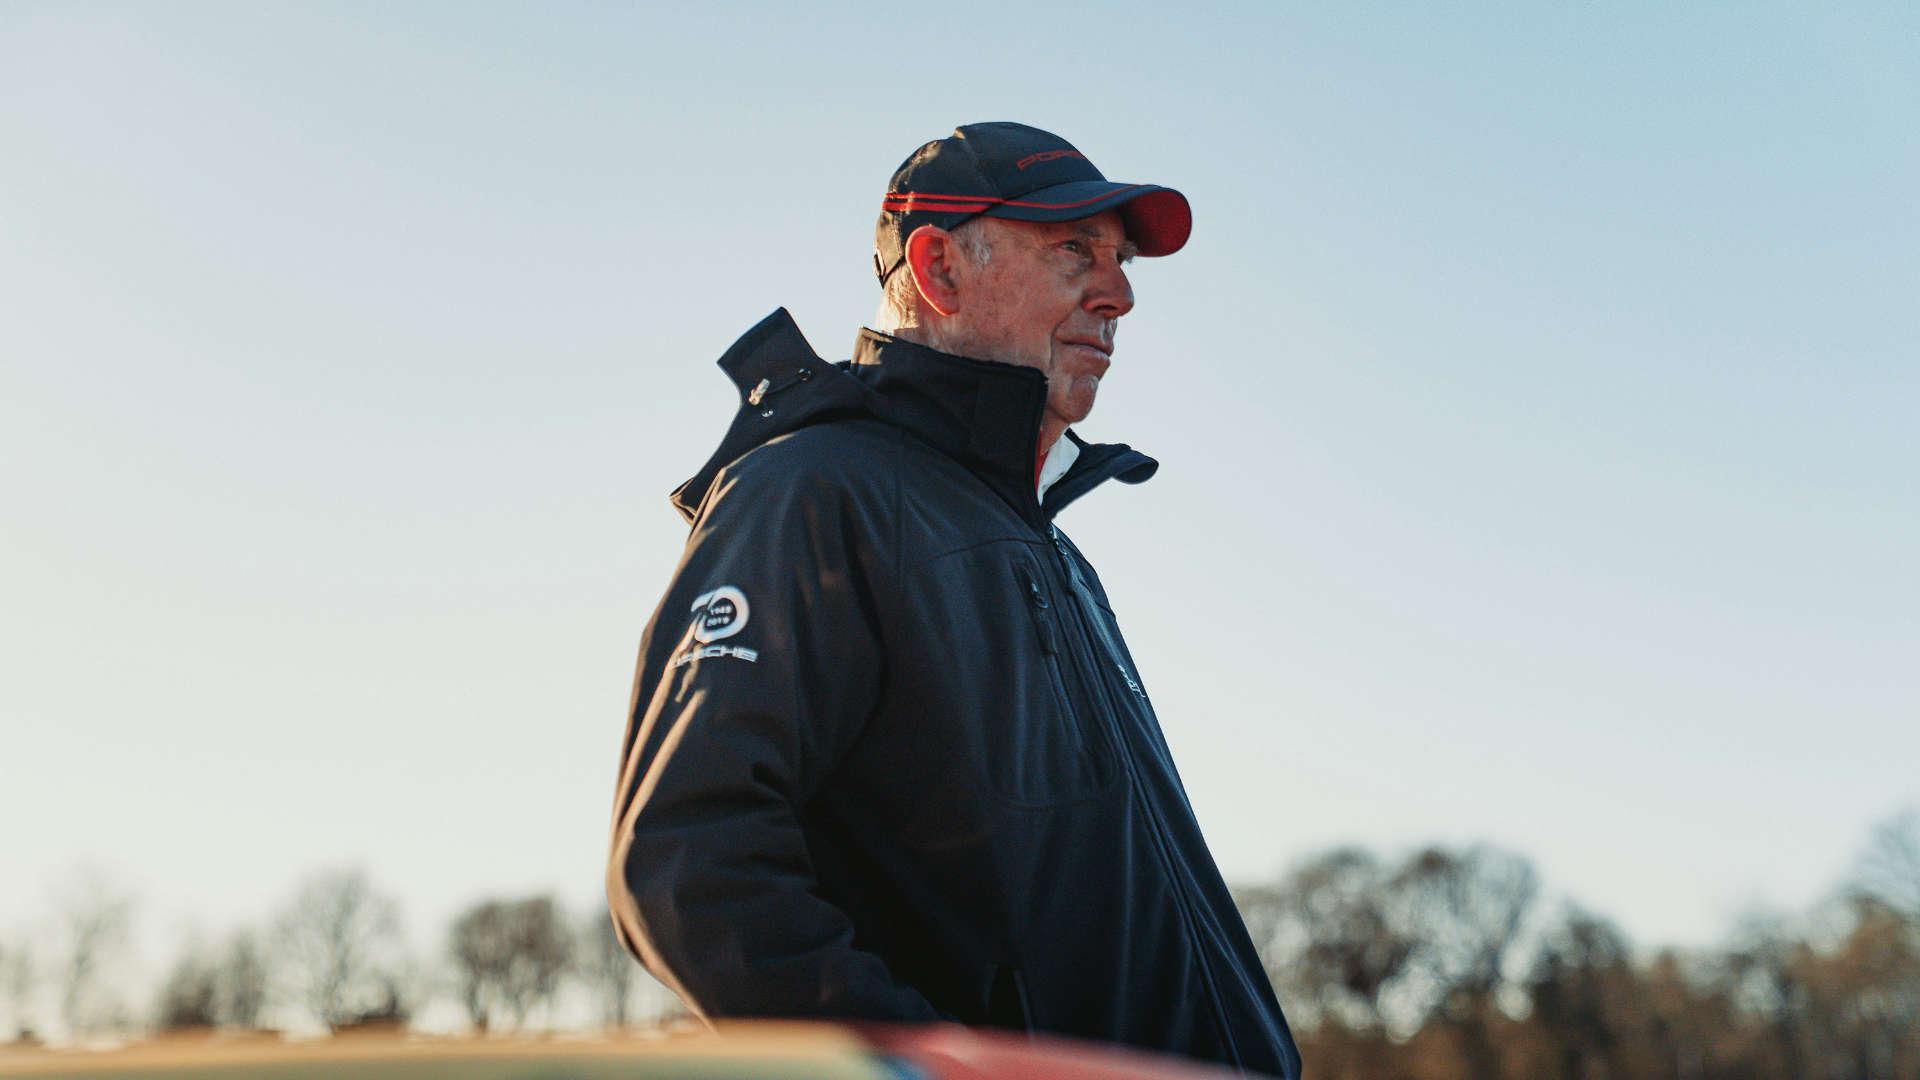 Richard Atwood Brands Hatch